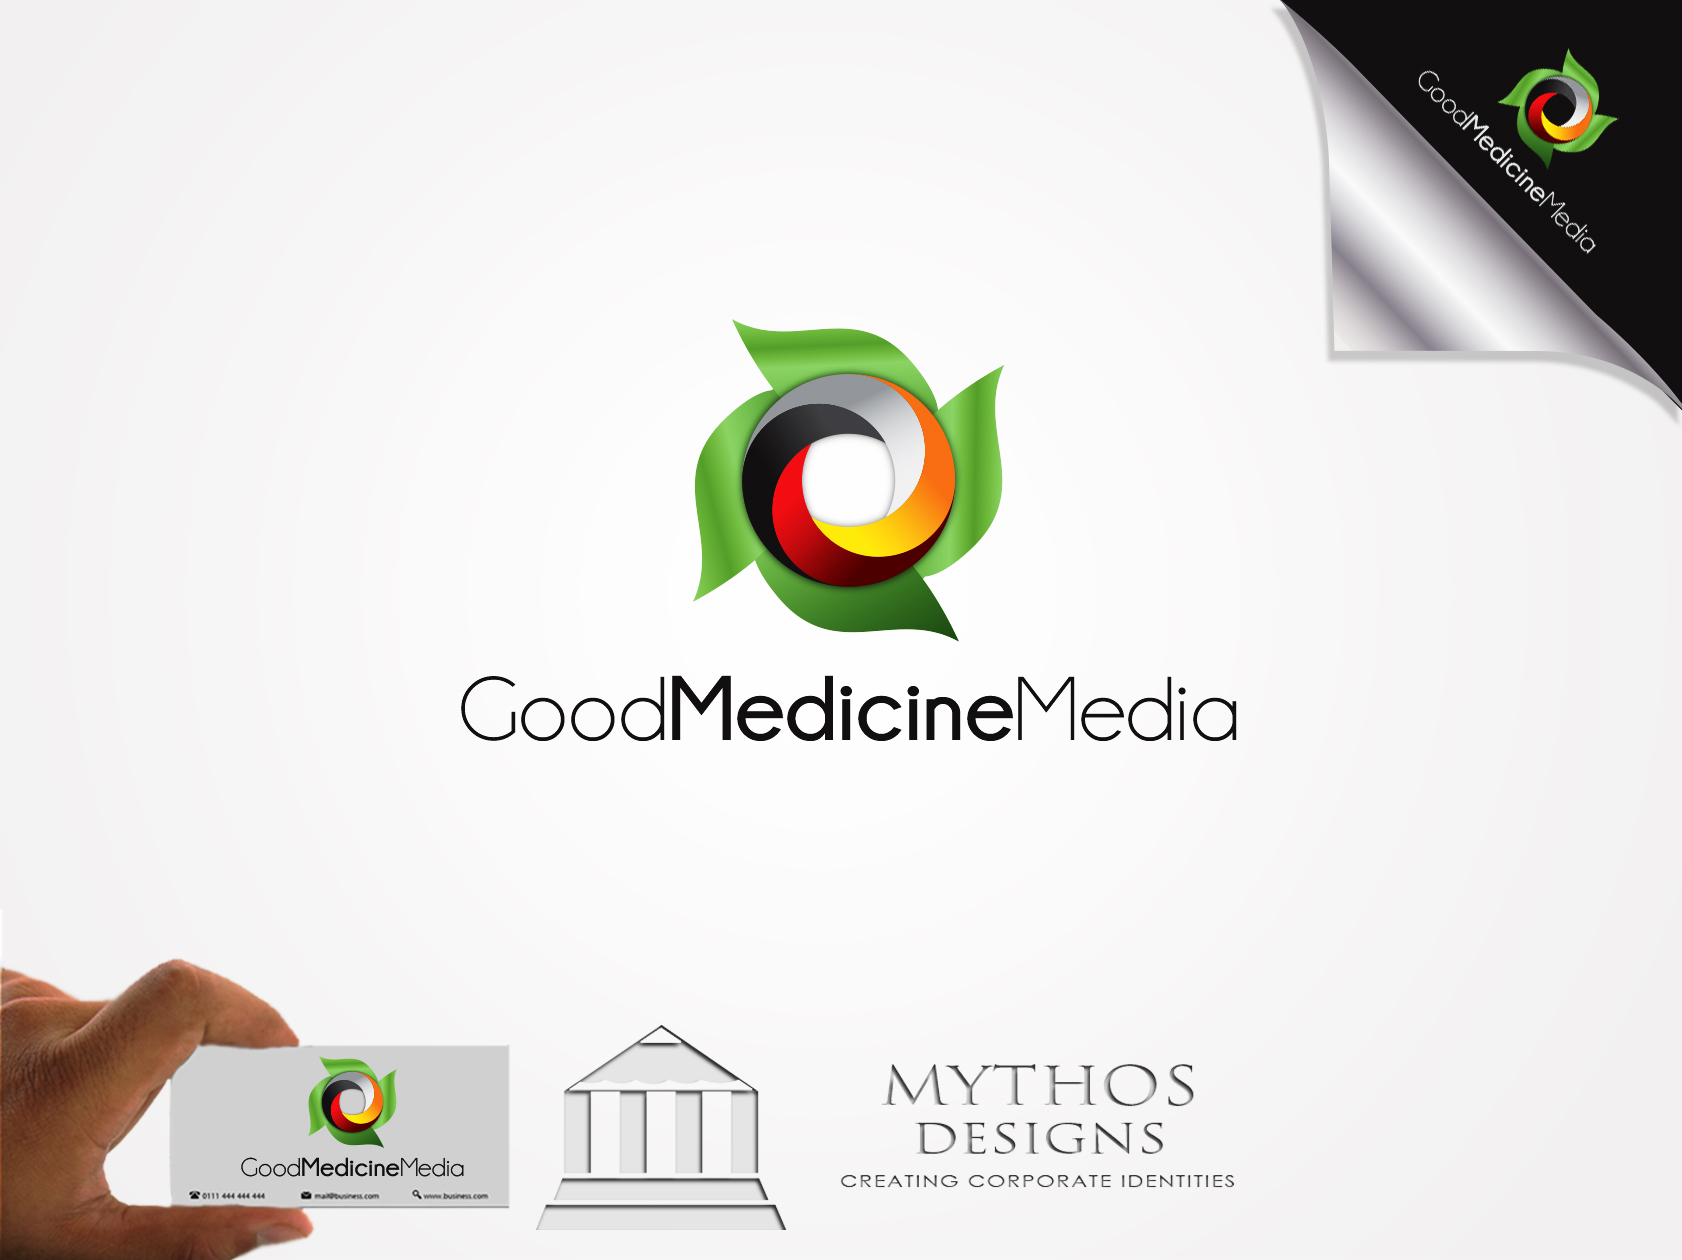 Logo Design by Mythos Designs - Entry No. 237 in the Logo Design Contest Good Medicine Media Logo Design.